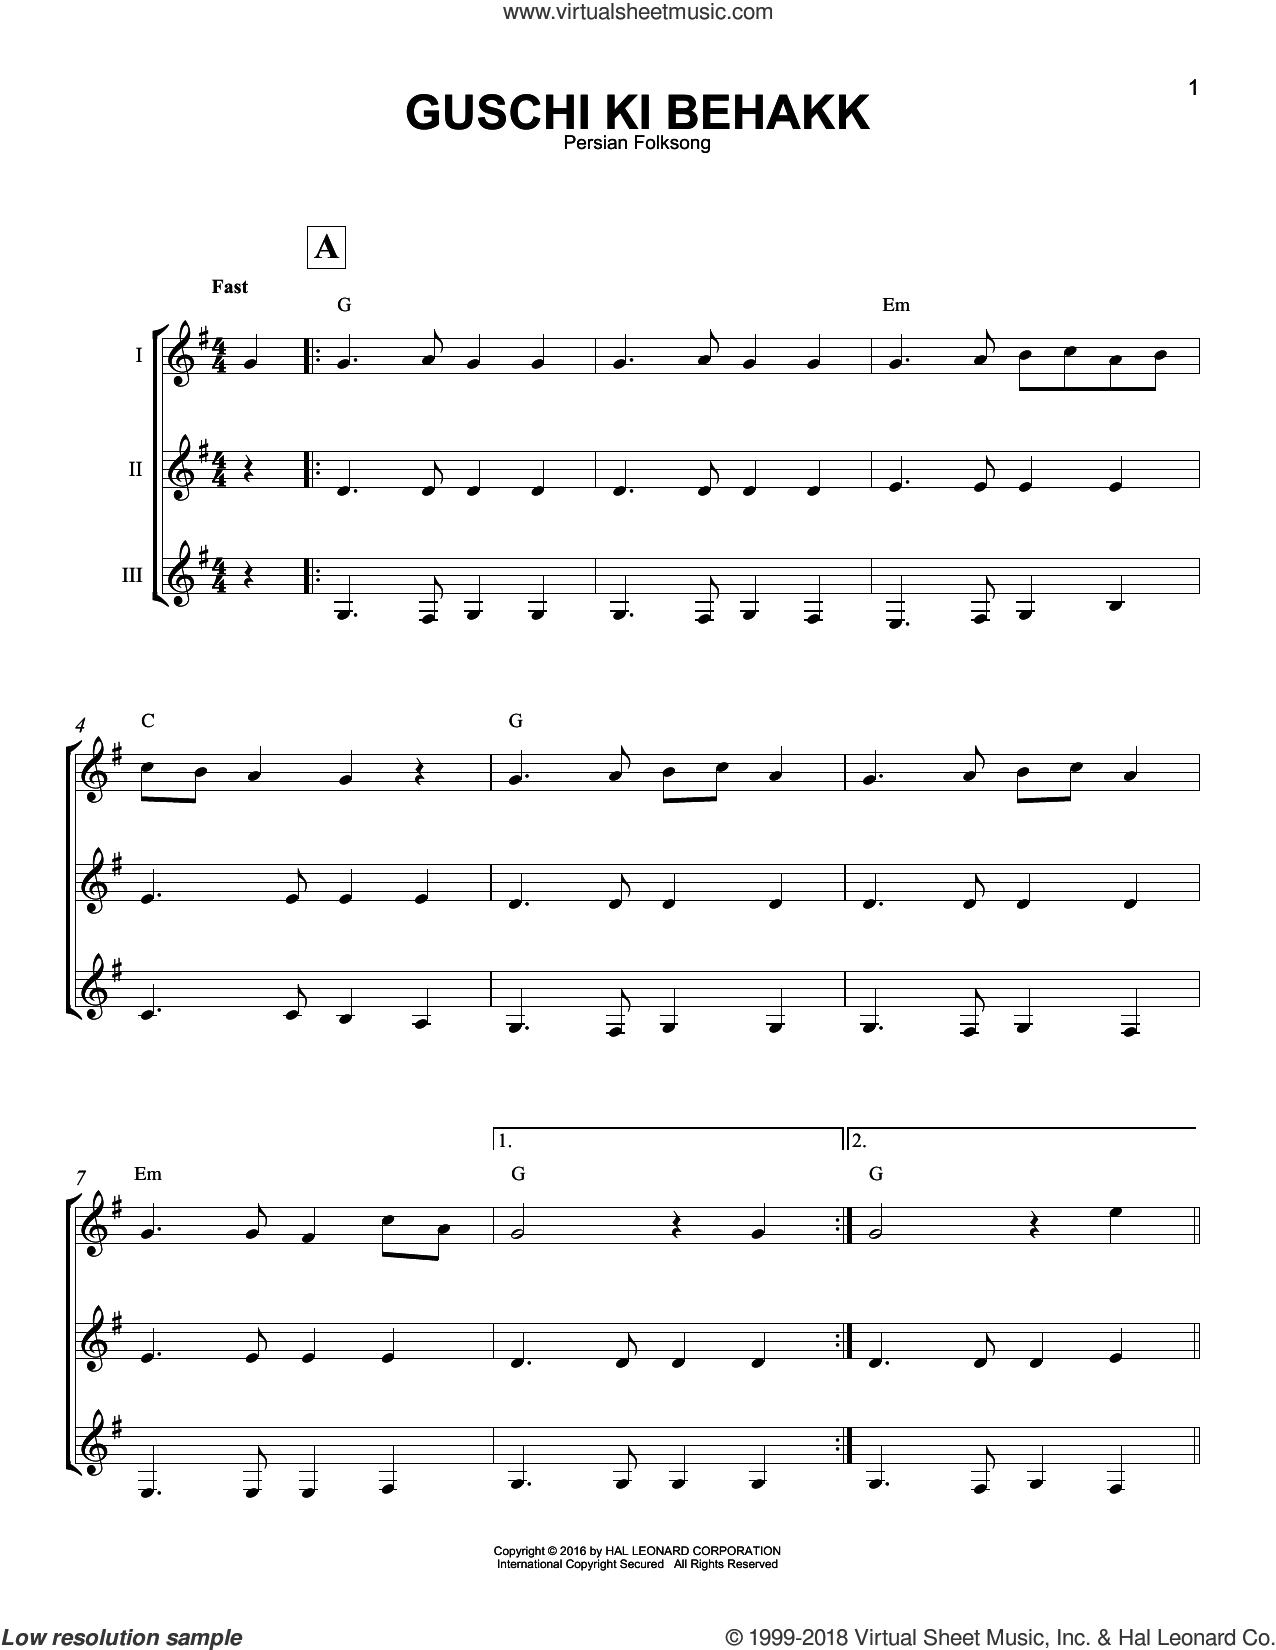 Guschi Ki Behakk sheet music for guitar ensemble by Persian Folksong, intermediate skill level